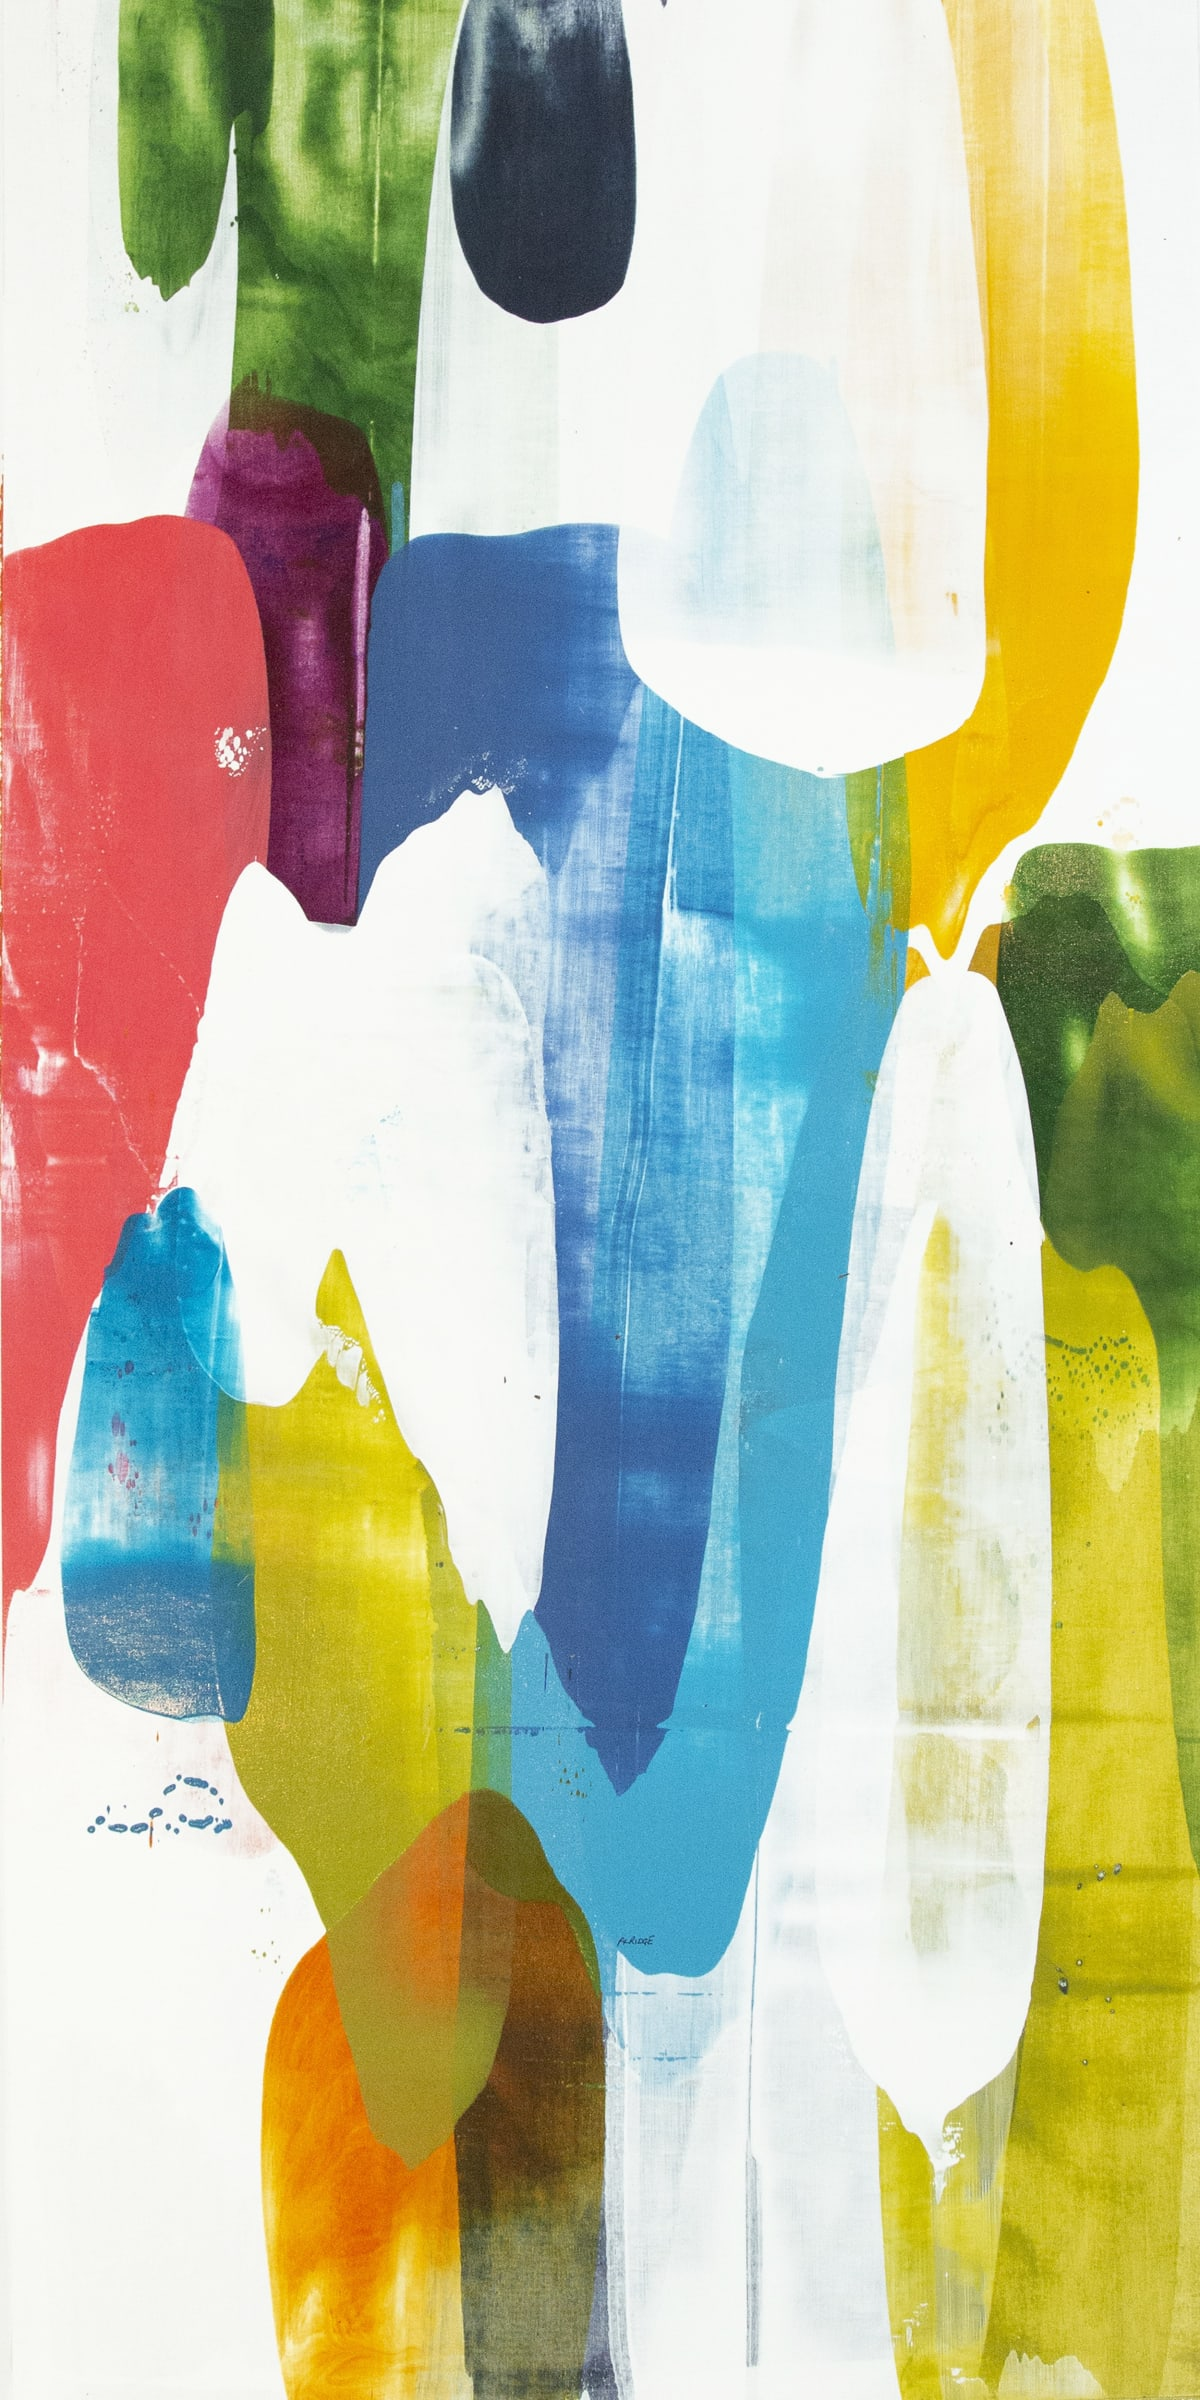 "Alridge Deep Spirit II Acrylic on Canvas 30 x 60"" unframed 32 x 62"" framed"